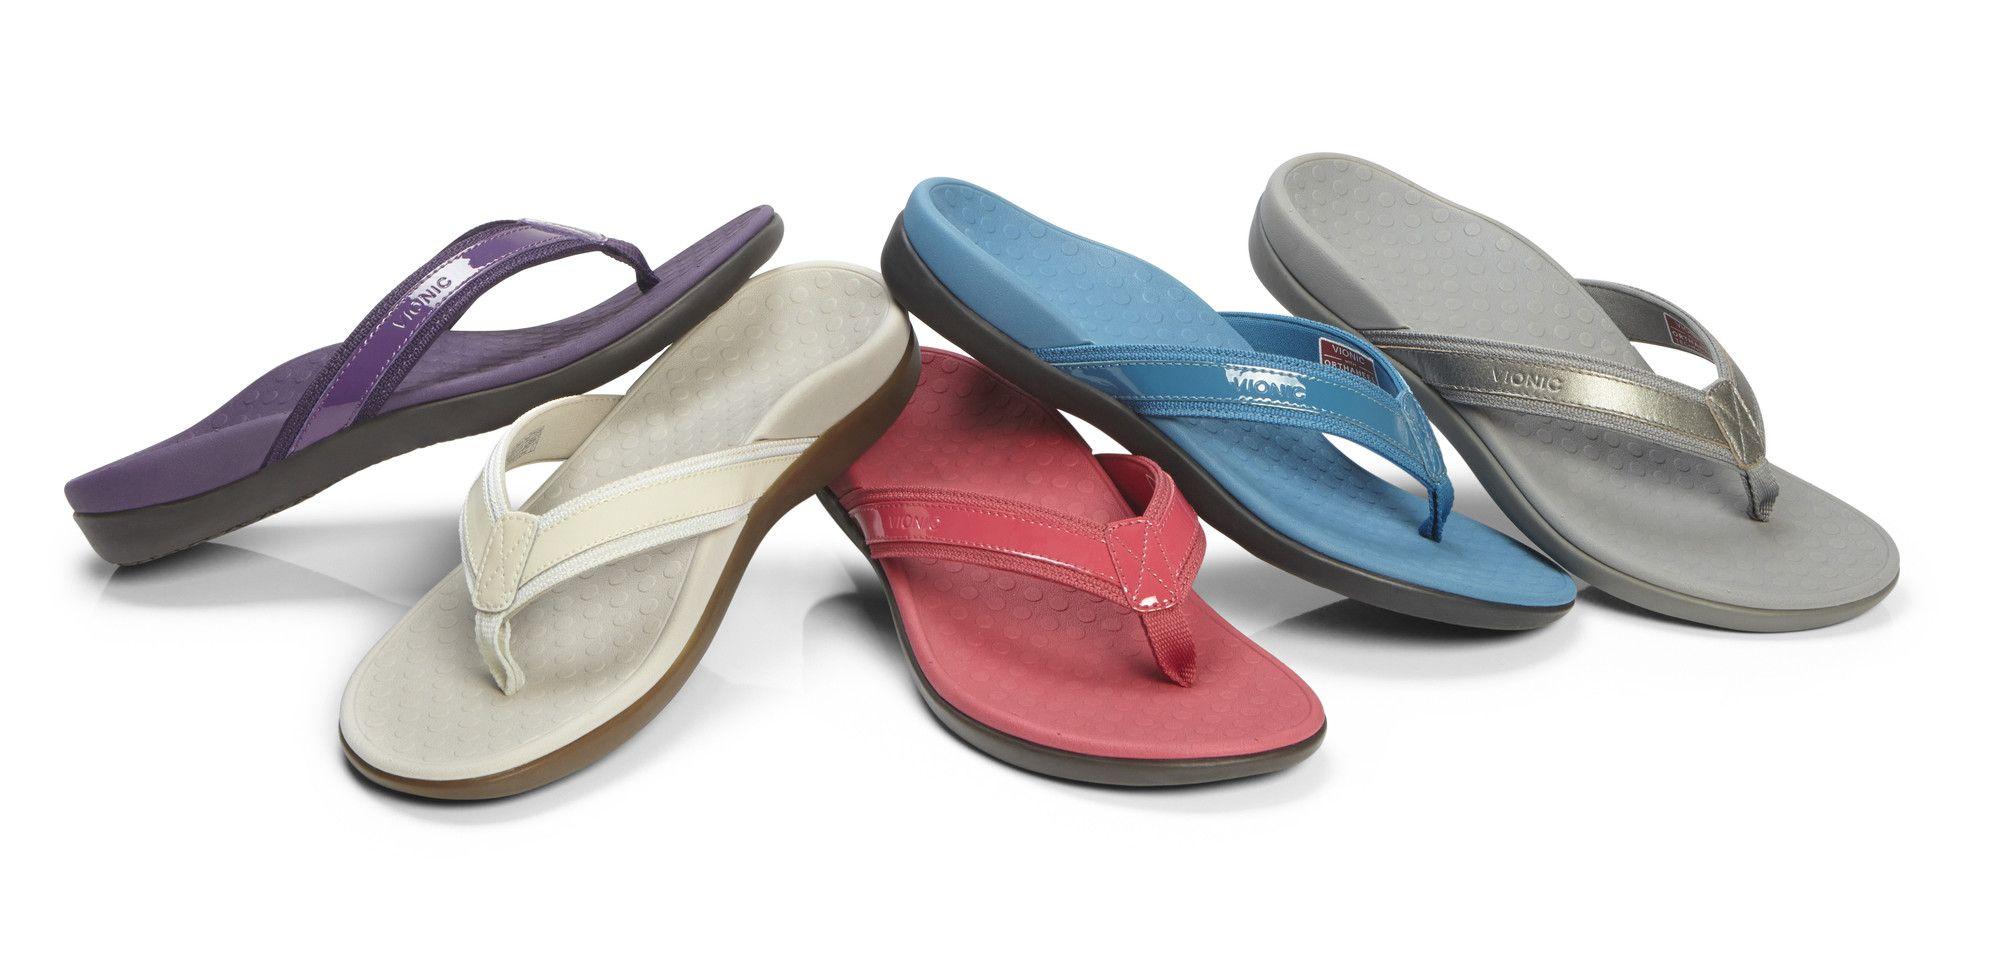 Vionic Tide II Women's Leather Orthotic Sandals Orthaheel